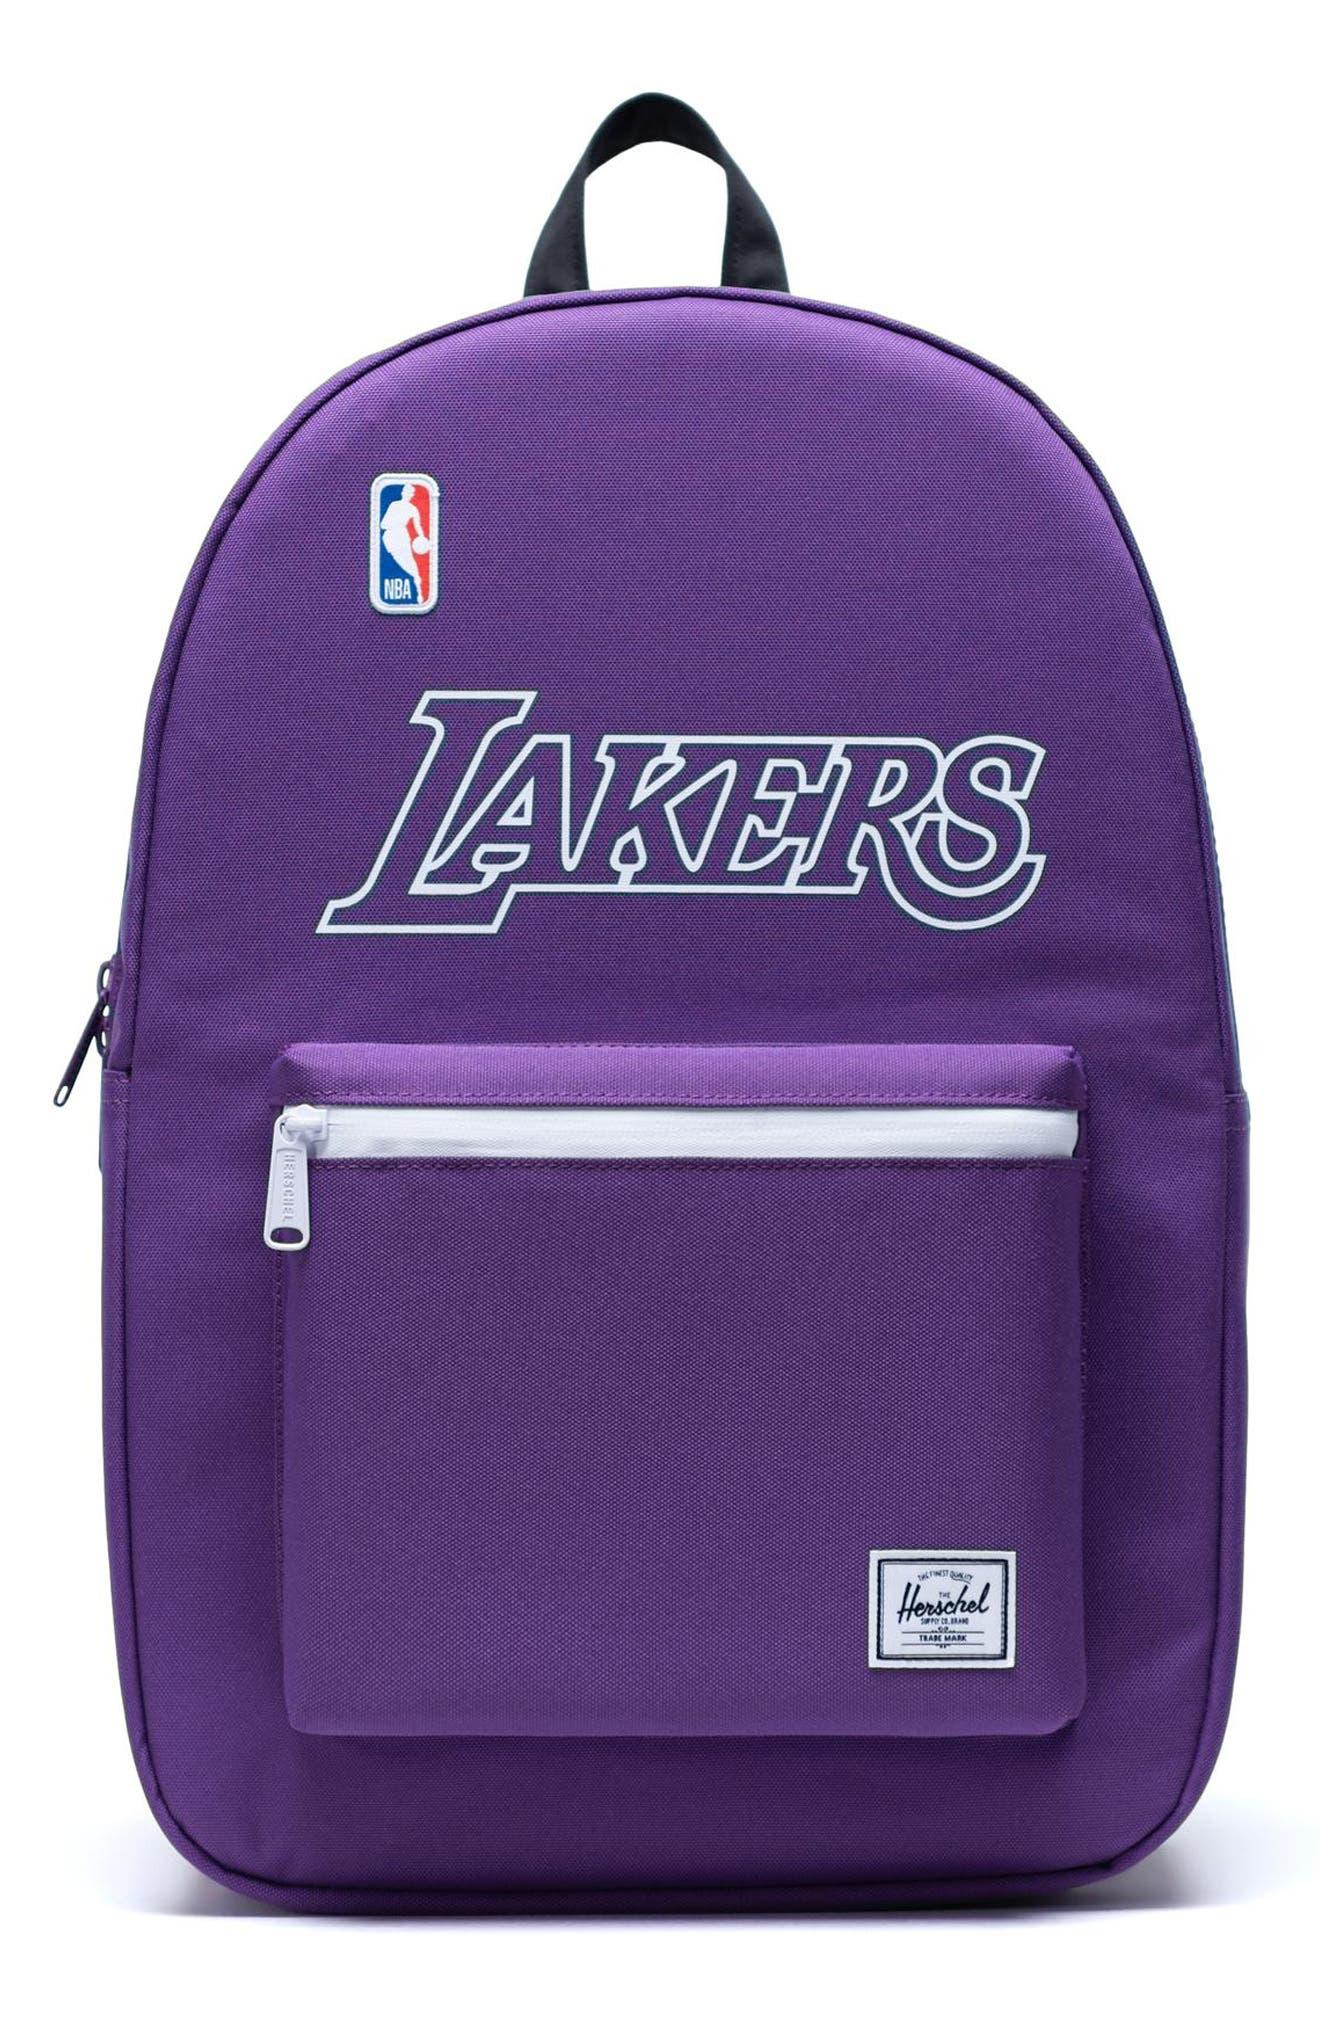 Herschel Supply Co. Settlement Nba Champions 15-Inch Laptop Backpack - Purple